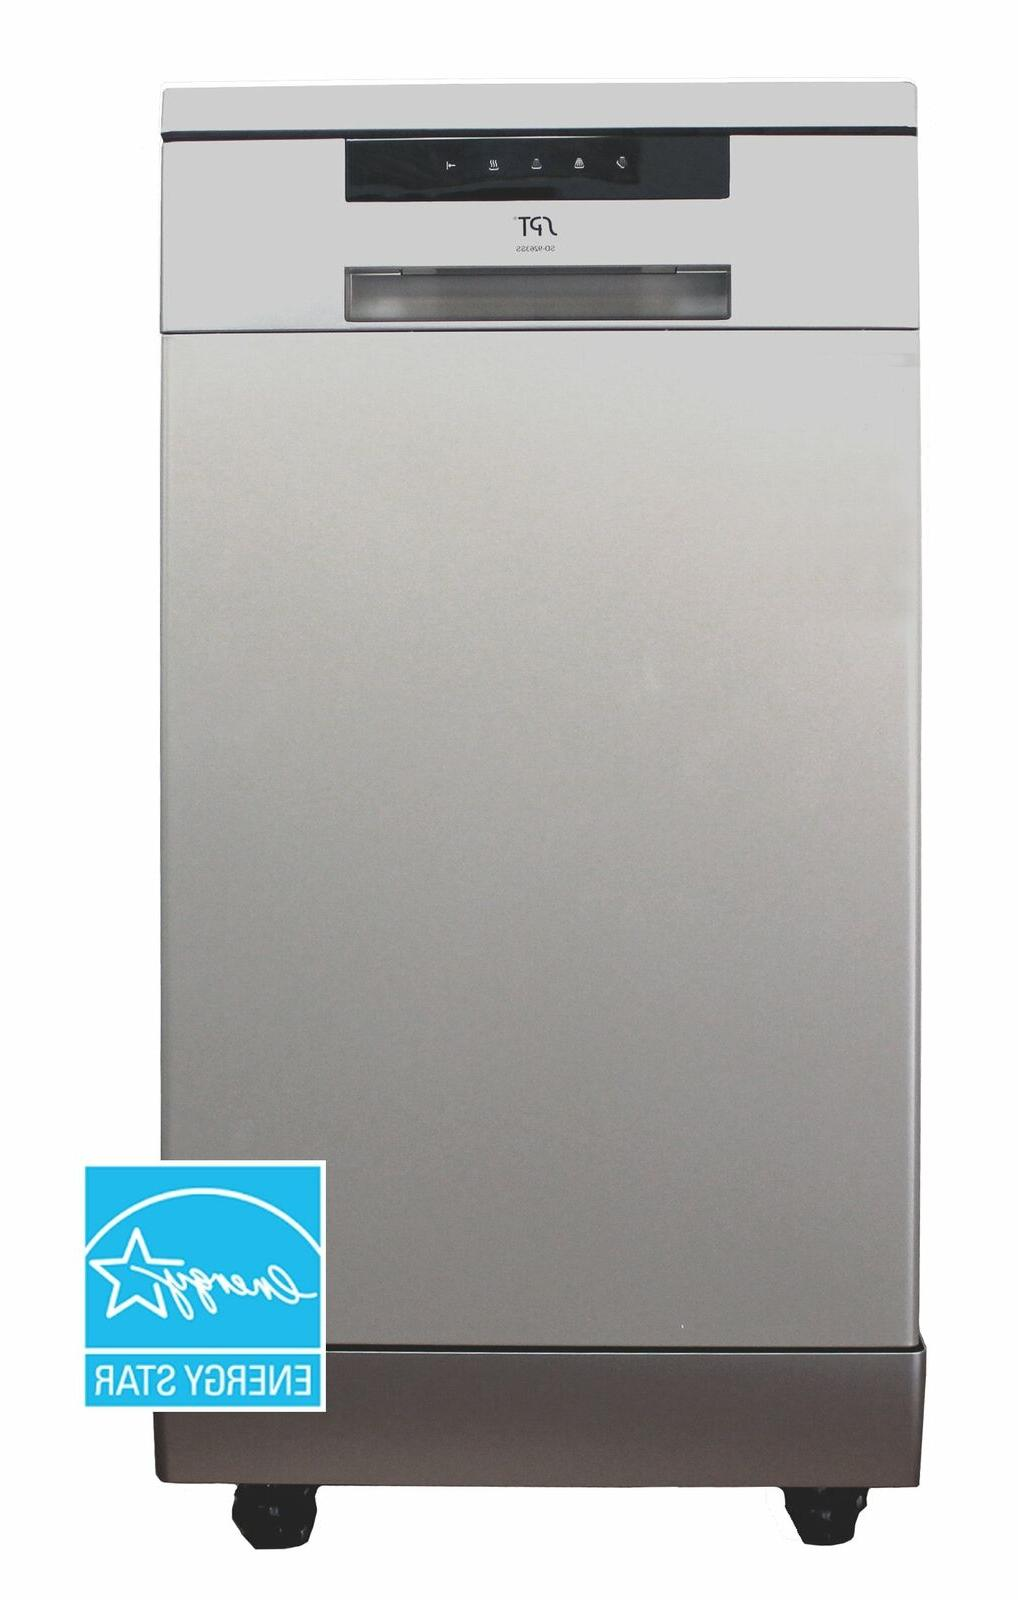 spt 18 portable dishwasher energy star stainless